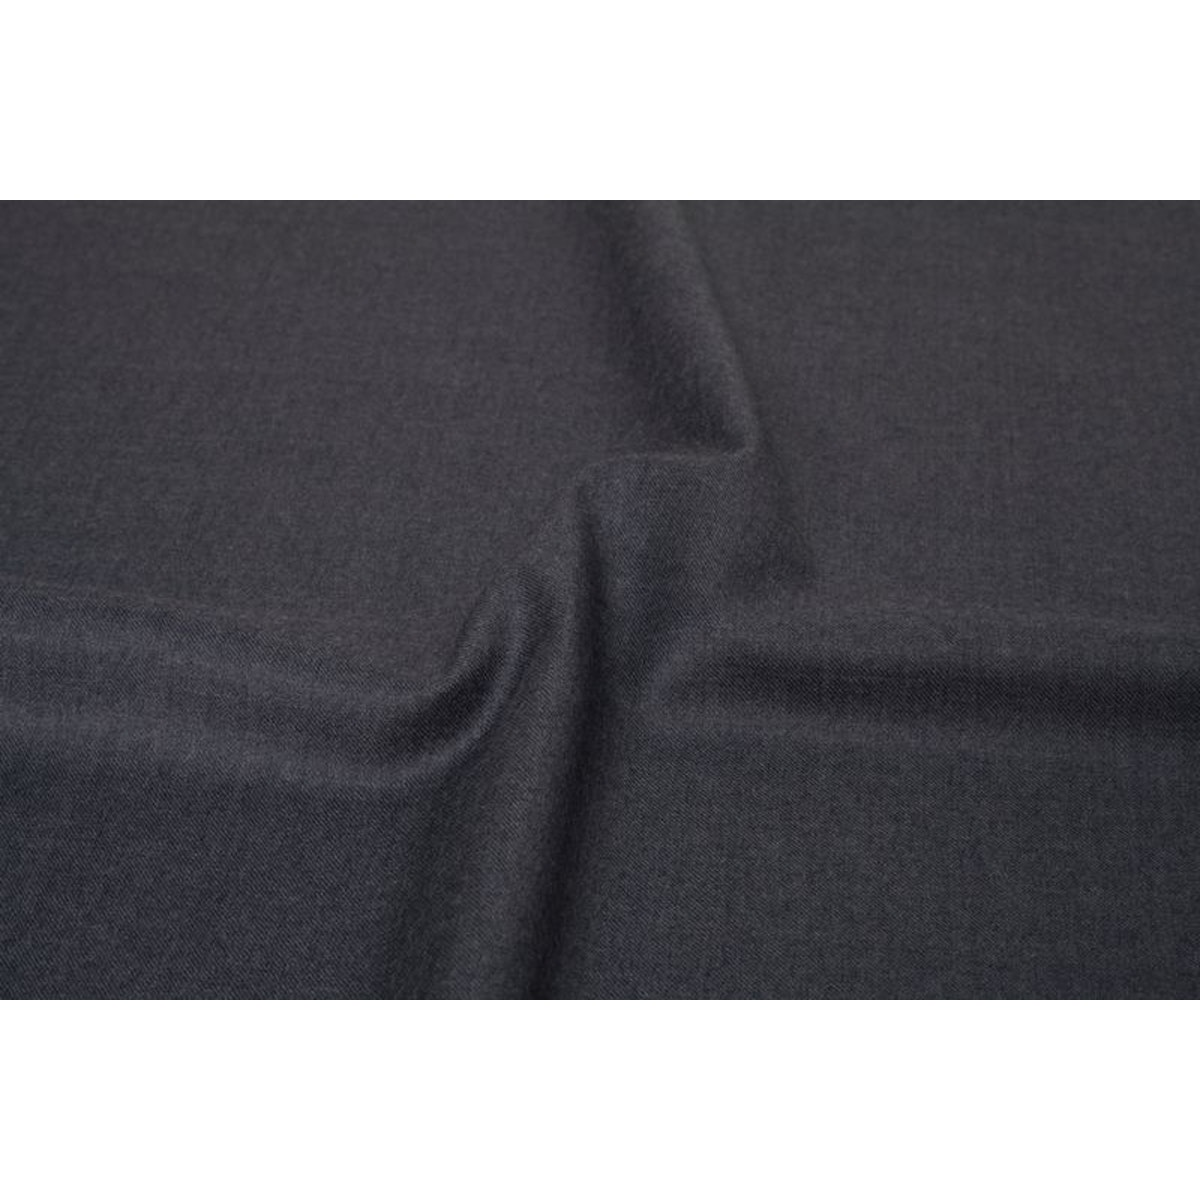 InStitchu Suit Fabric 150